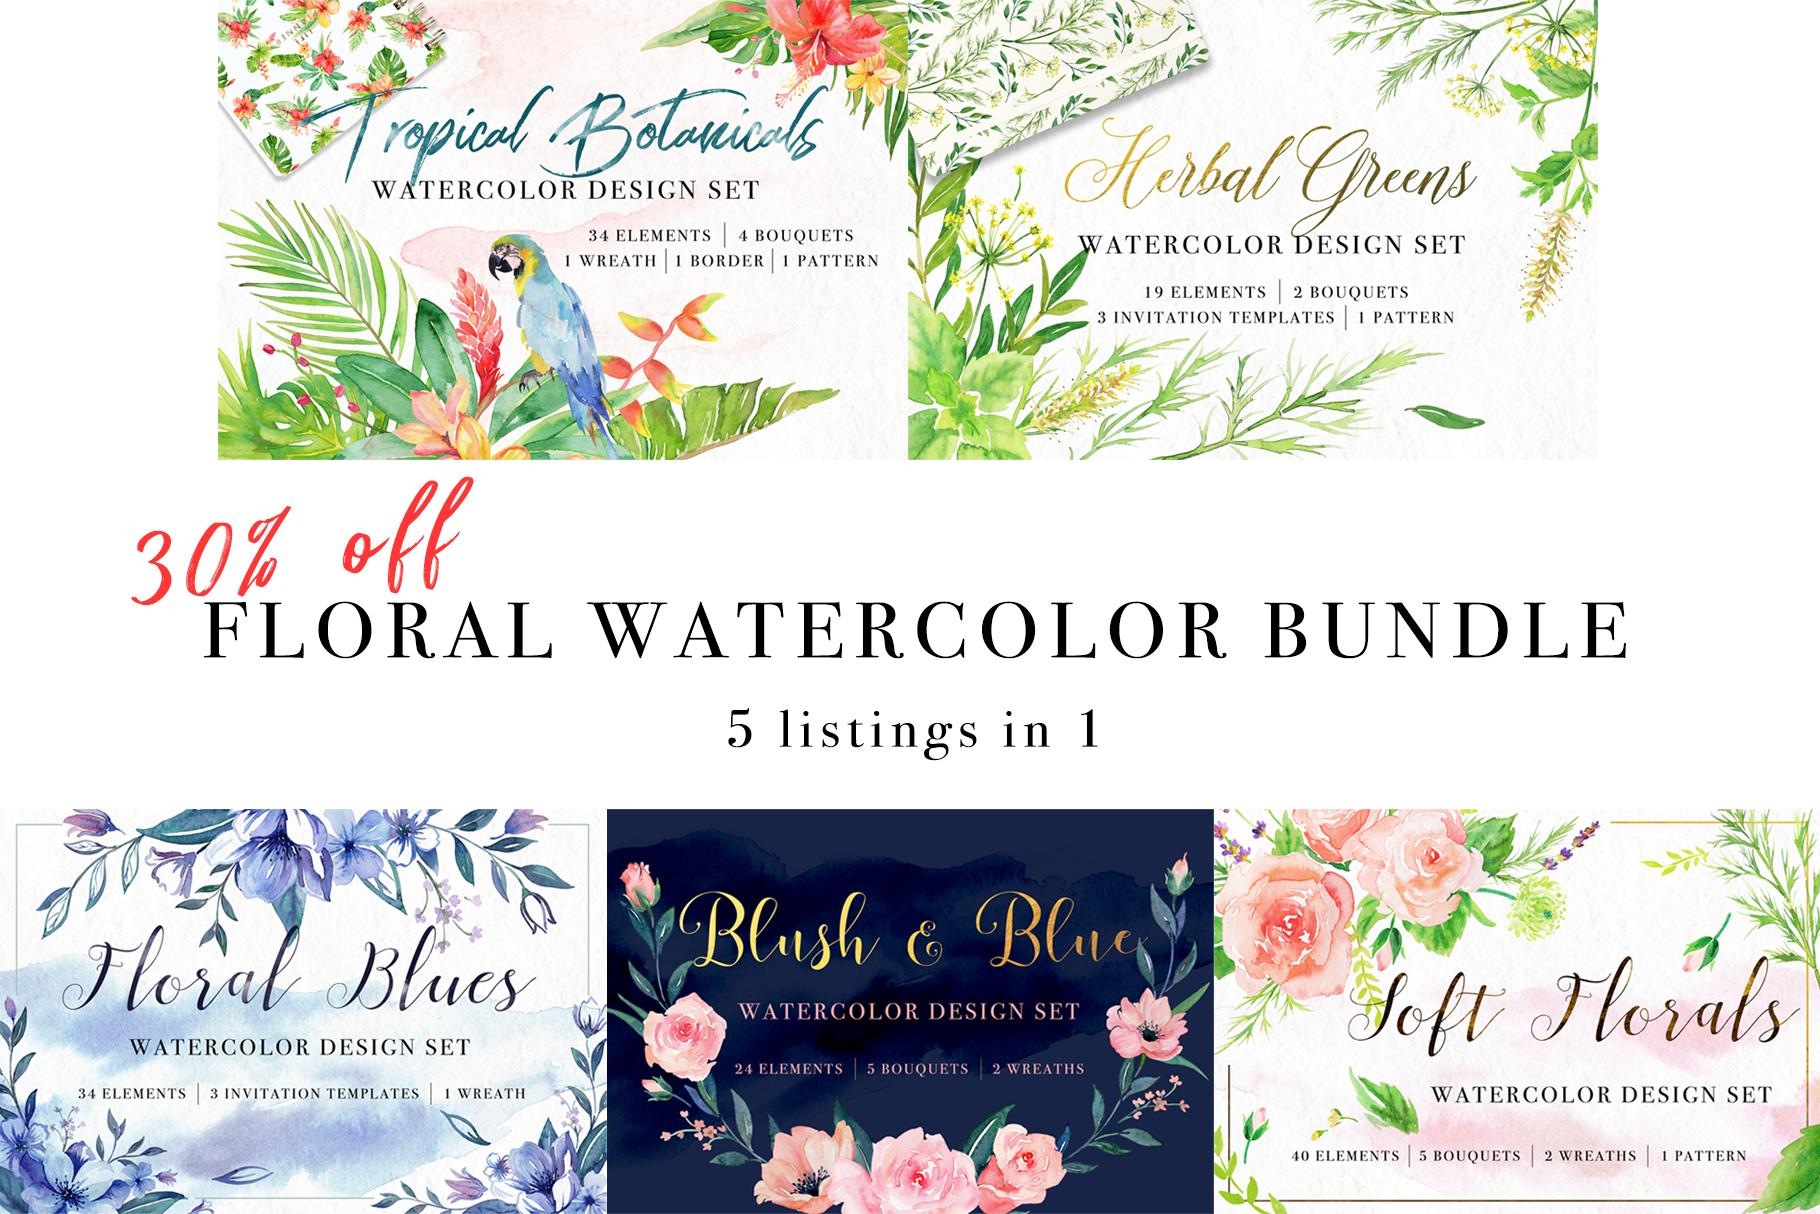 Floral Watercolor Bundle example image 1